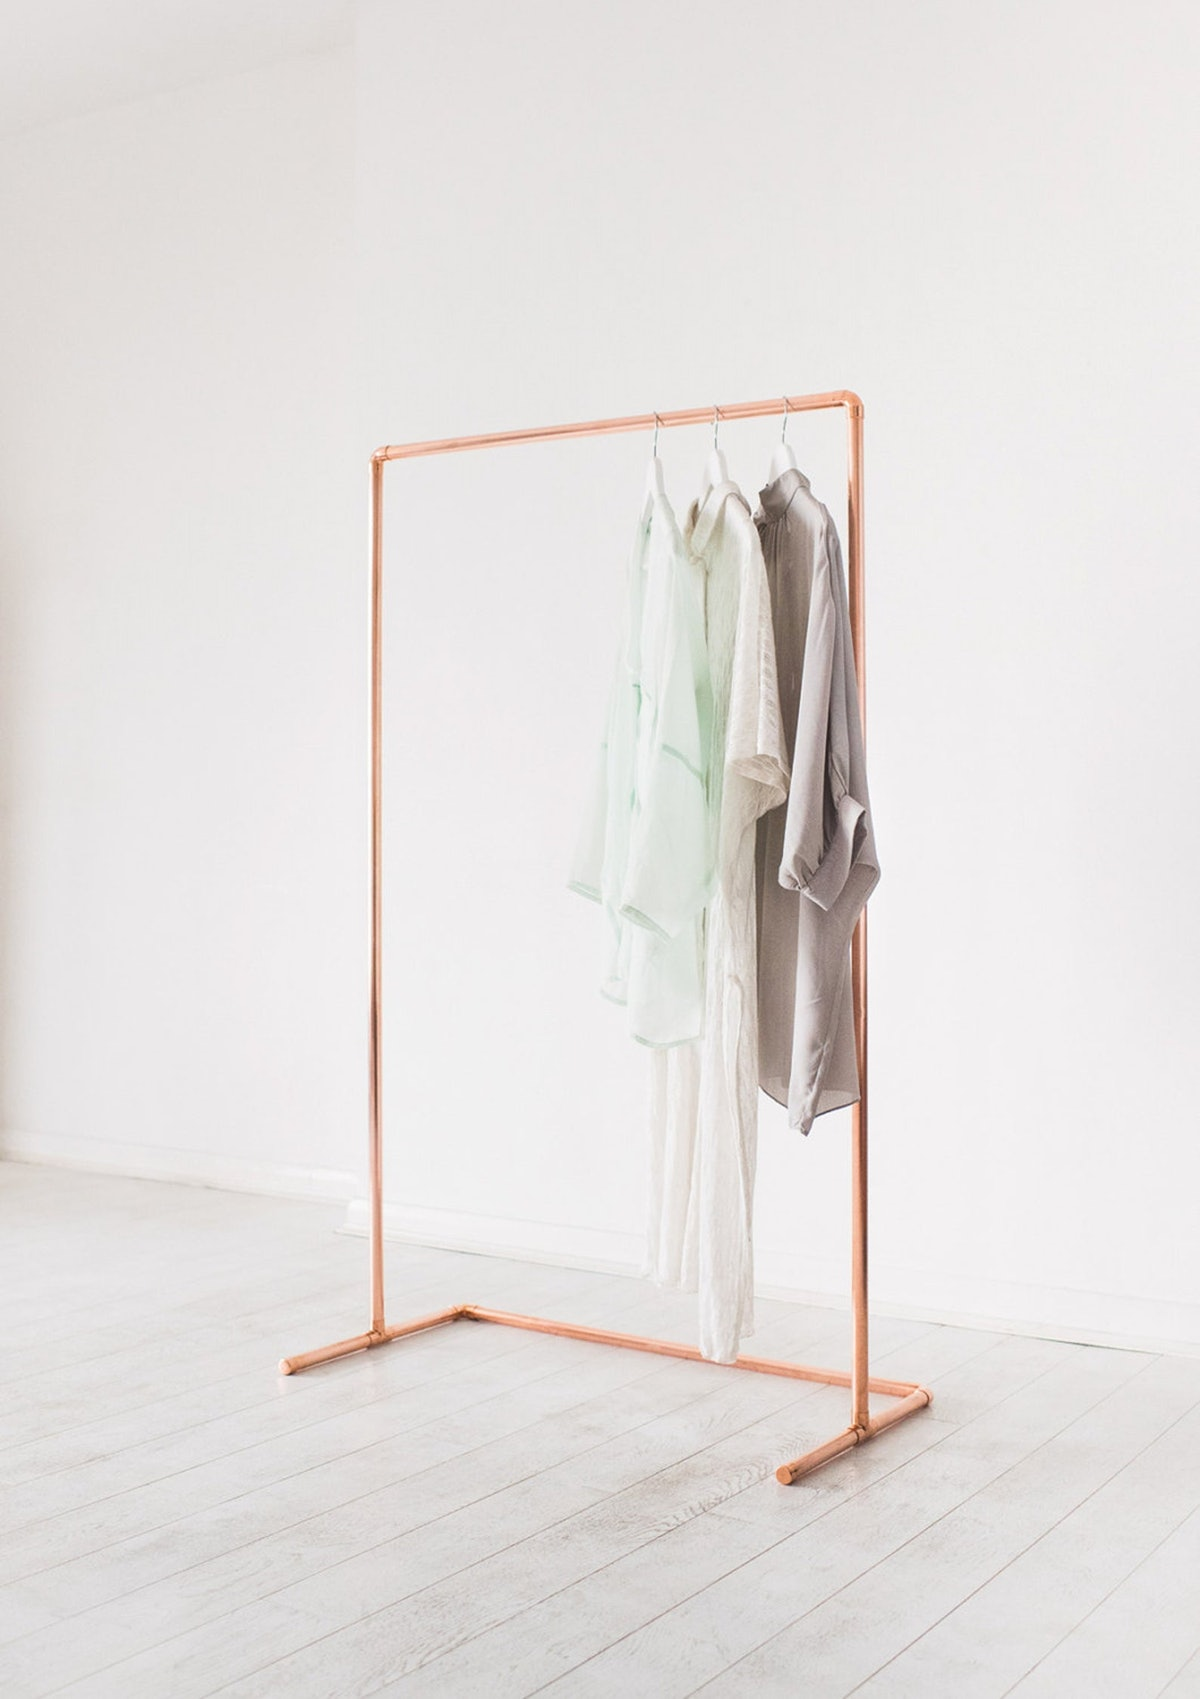 Minimal Copper Pipe Clothing Rail